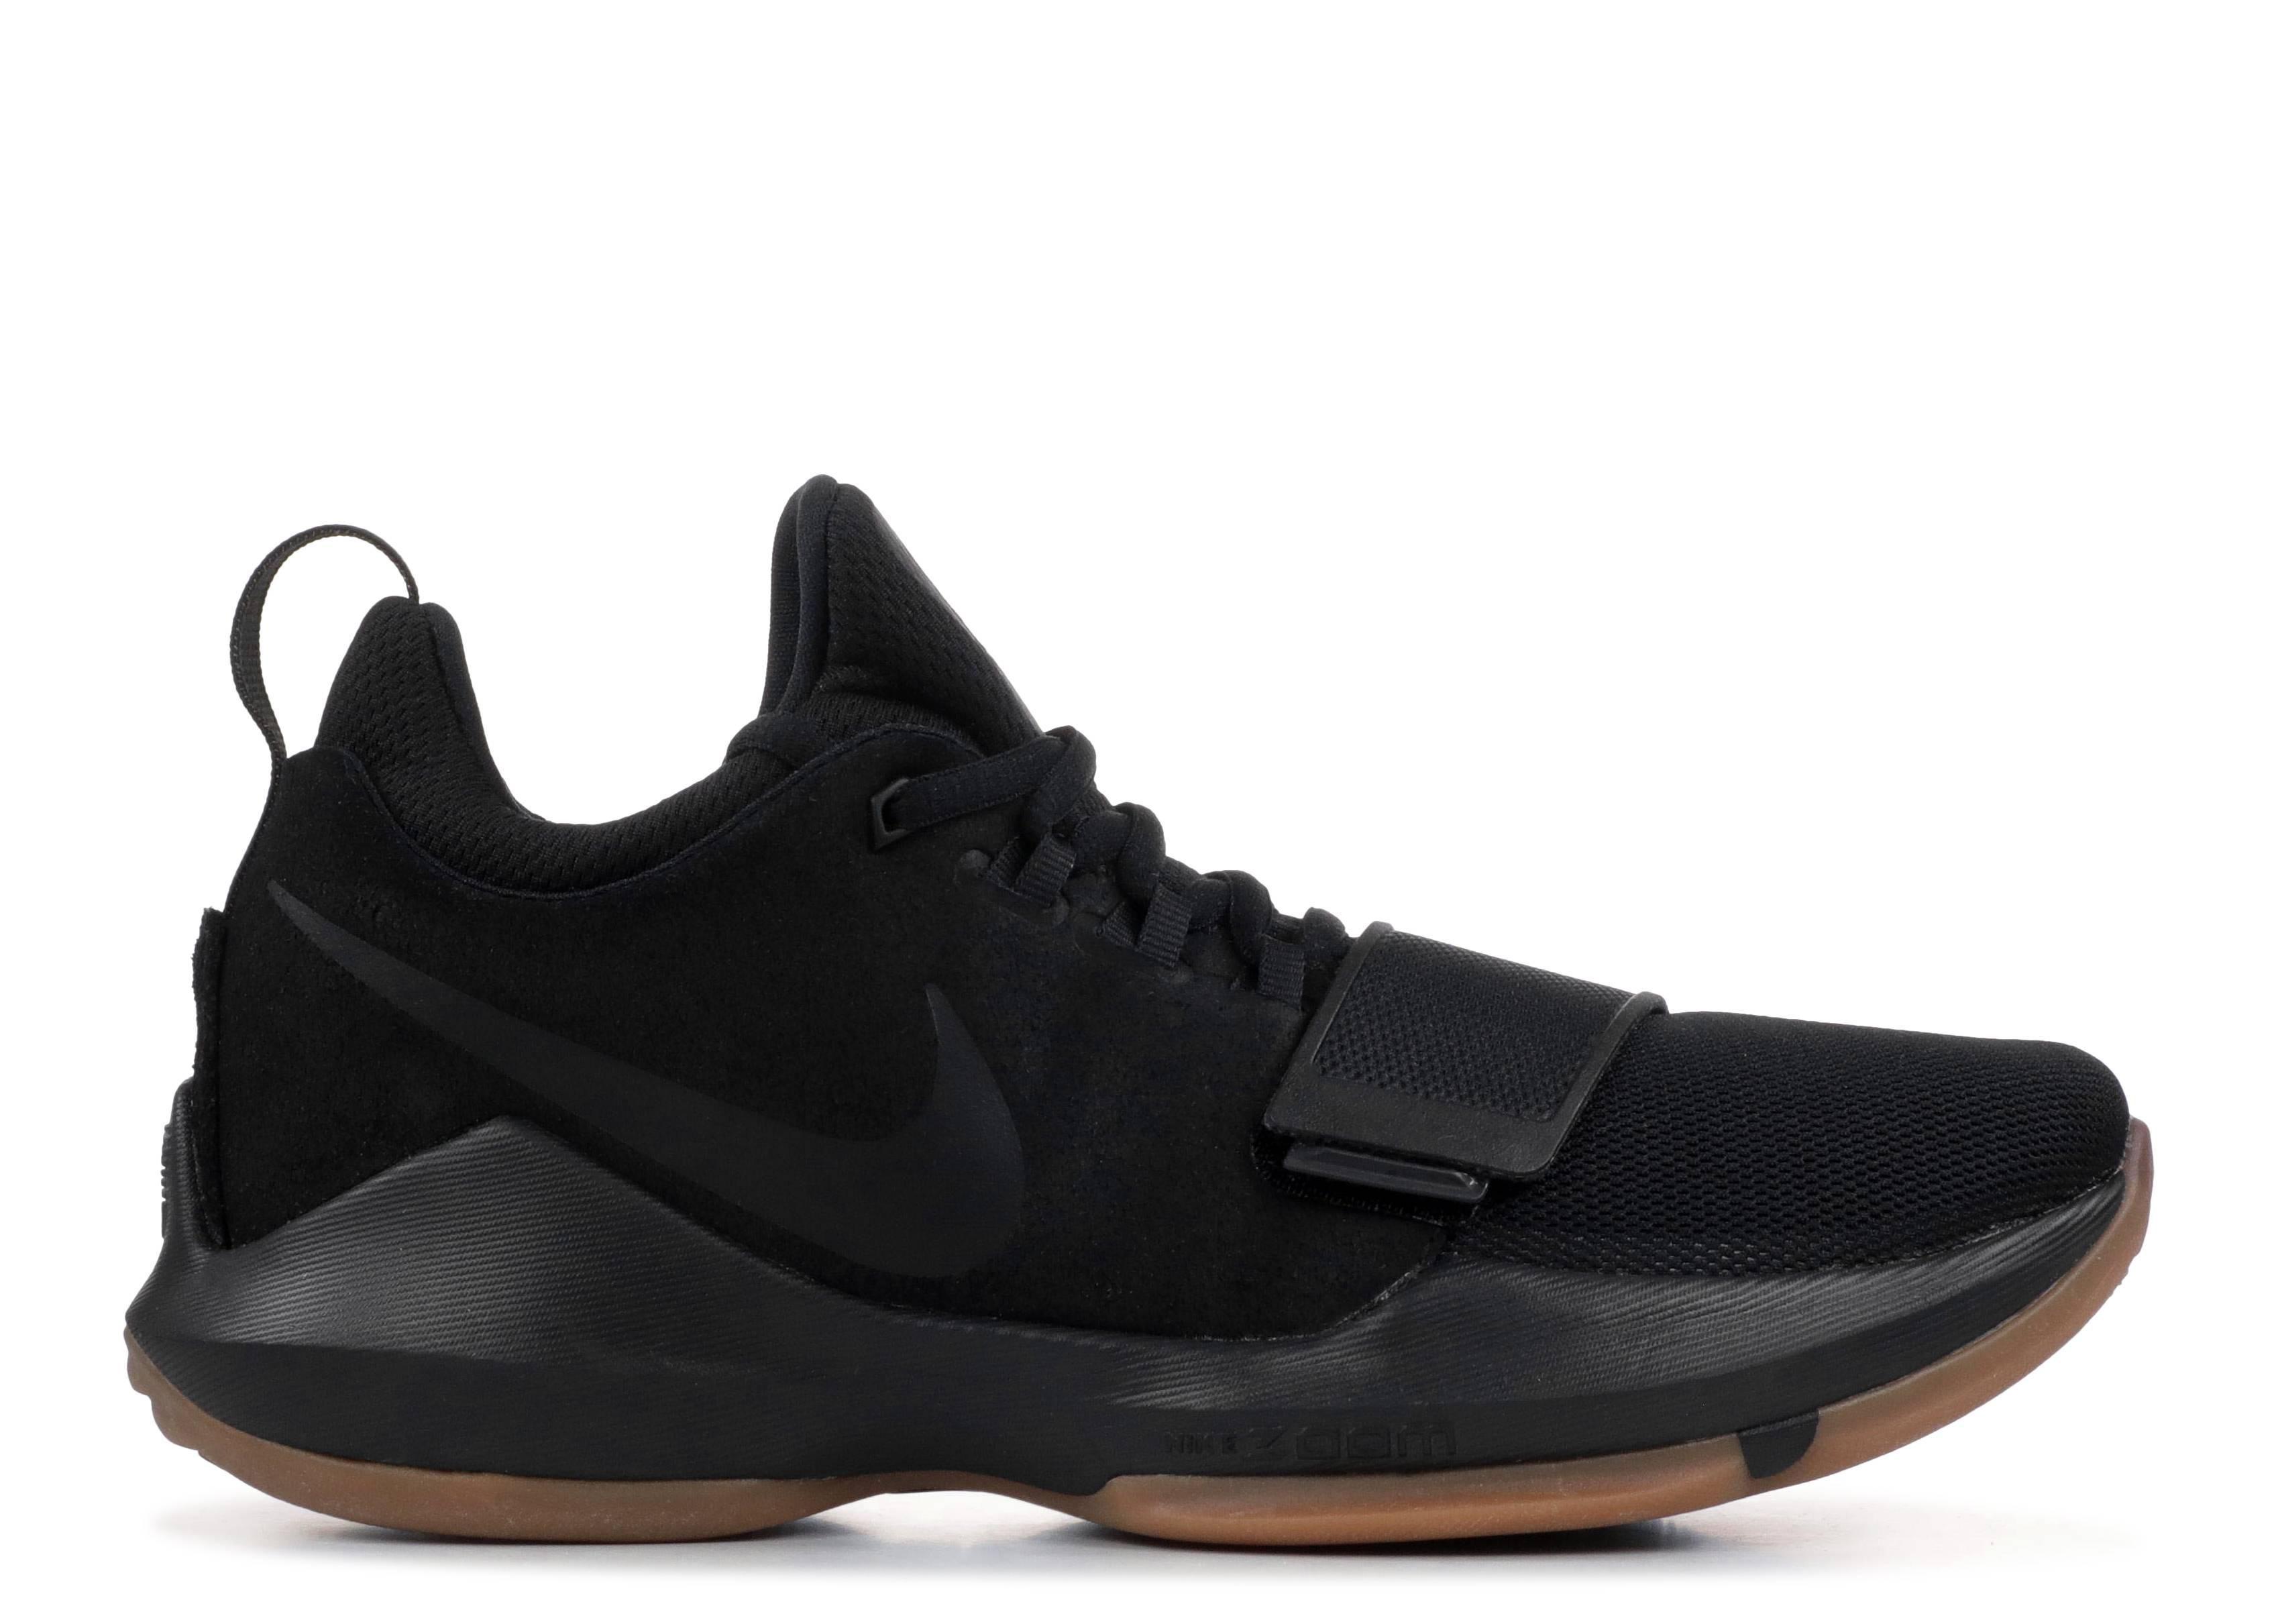 480ab569403c Pg 1 - Nike - 878627 004 - black black - anthracite